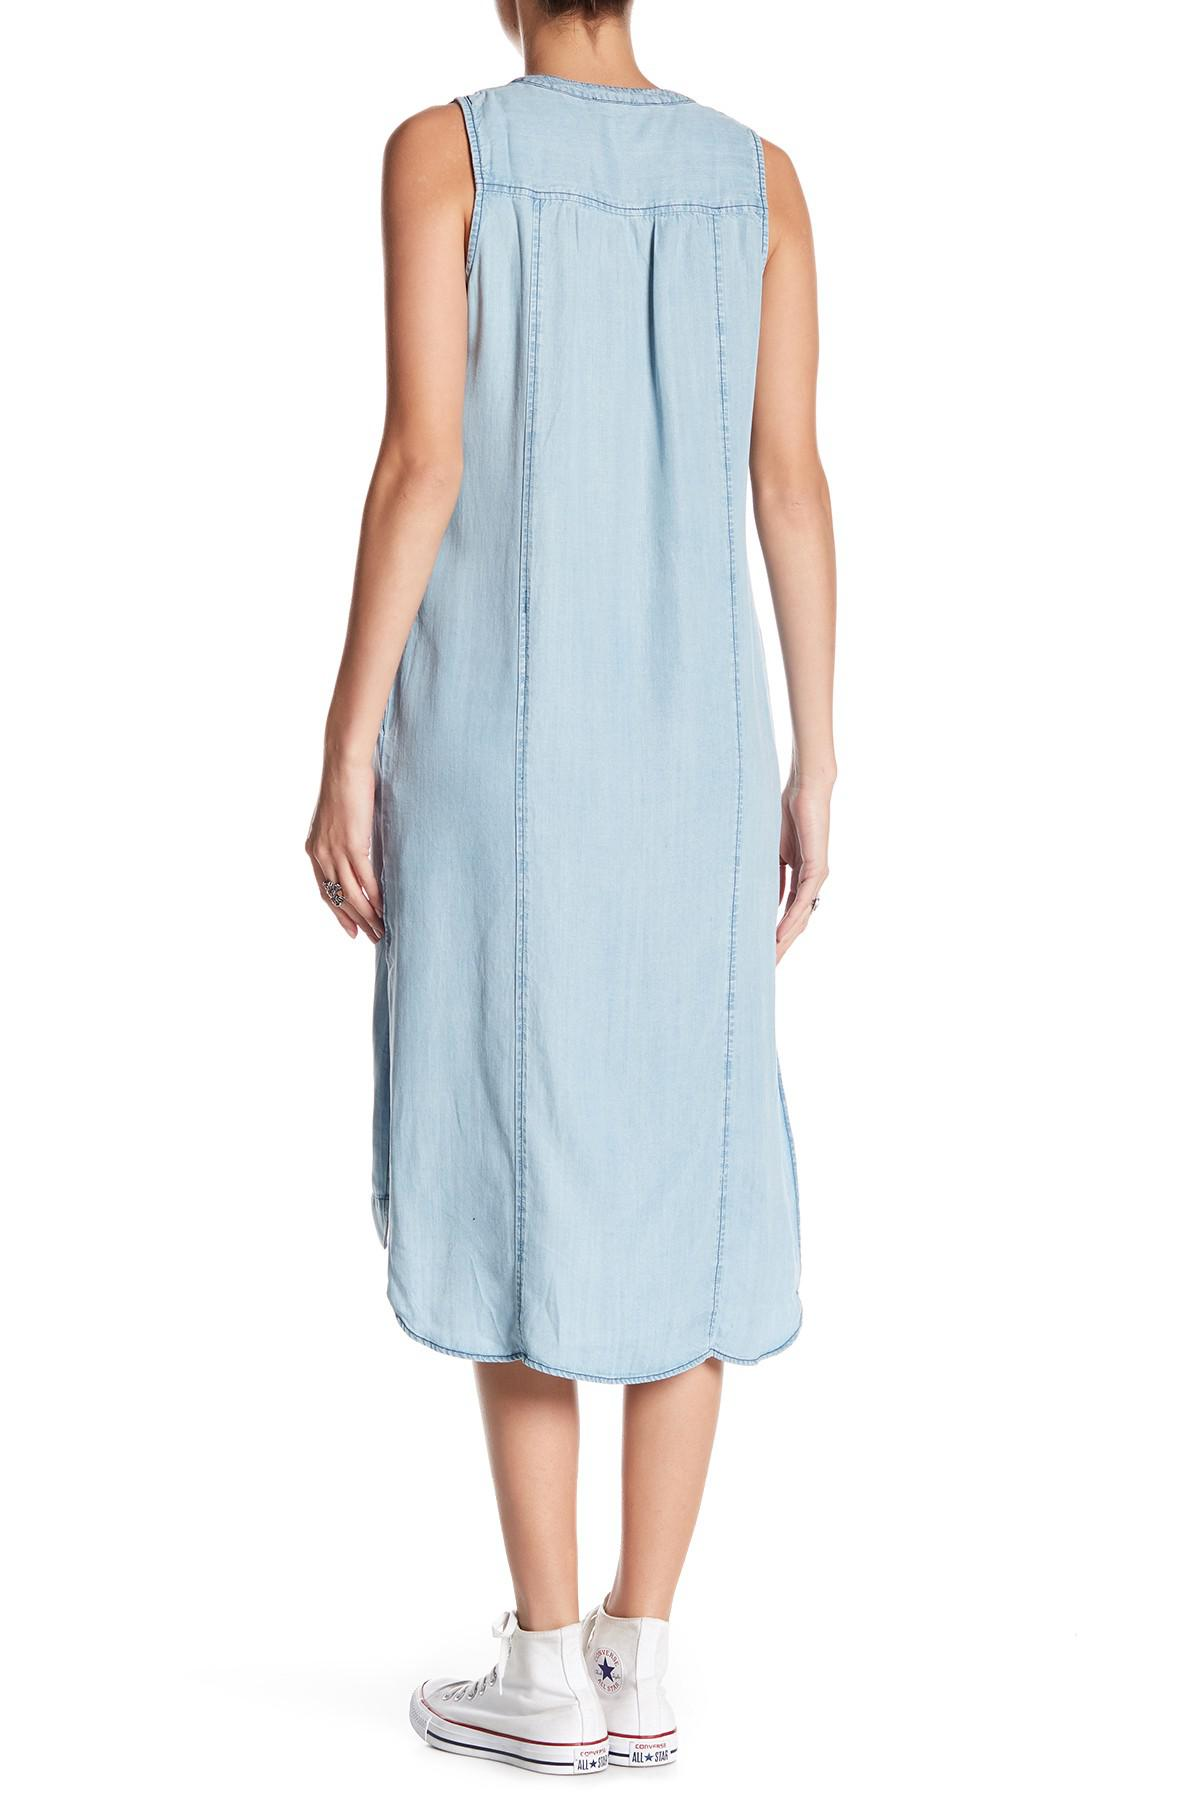 6a874b552f Love Stitch Sleeveless Chambray Midi Dress in Blue - Lyst